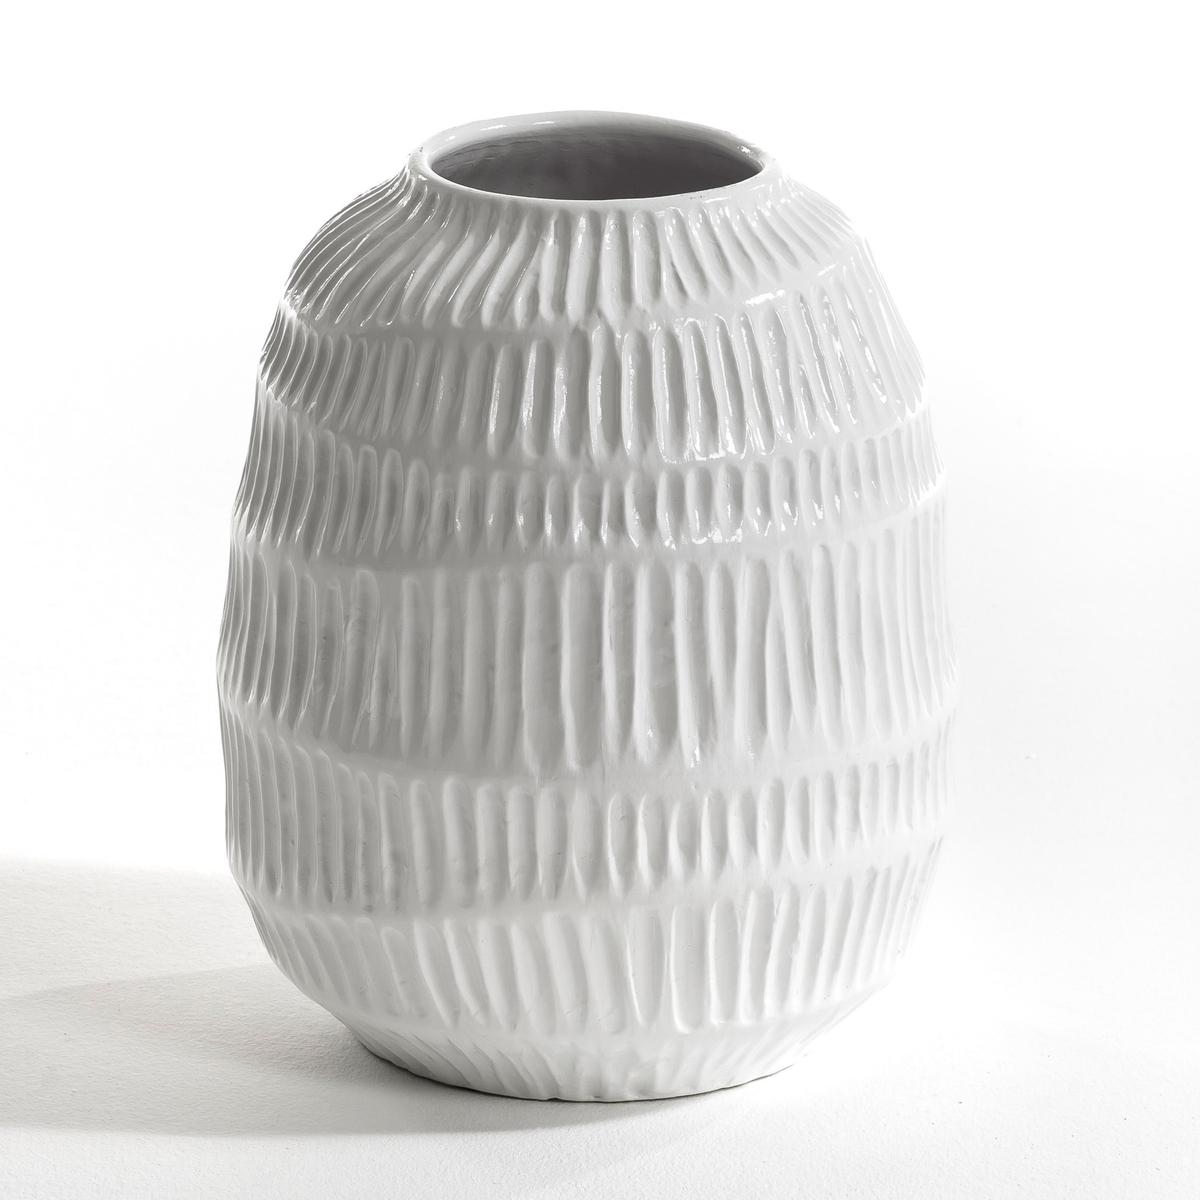 Ваза с рифлеными полосами Belzemine, дизайн E. Галлина